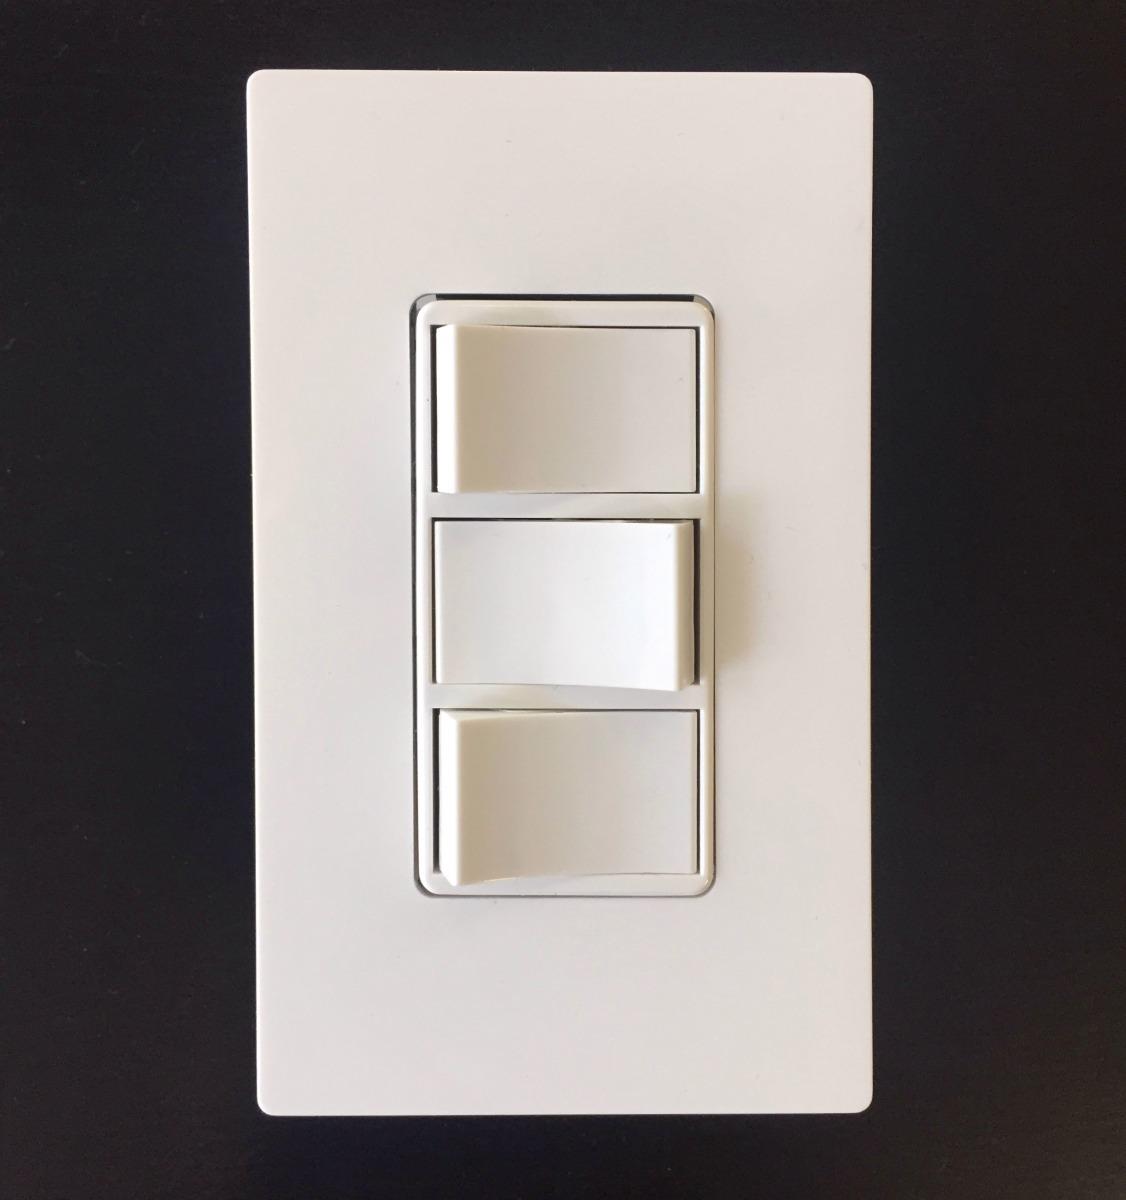 Switche Interruptor Triple 1755 Leviton Decora Tapa 80301 Bs 145 Light Switch Wiring Diagram Rocker Cargando Zoom